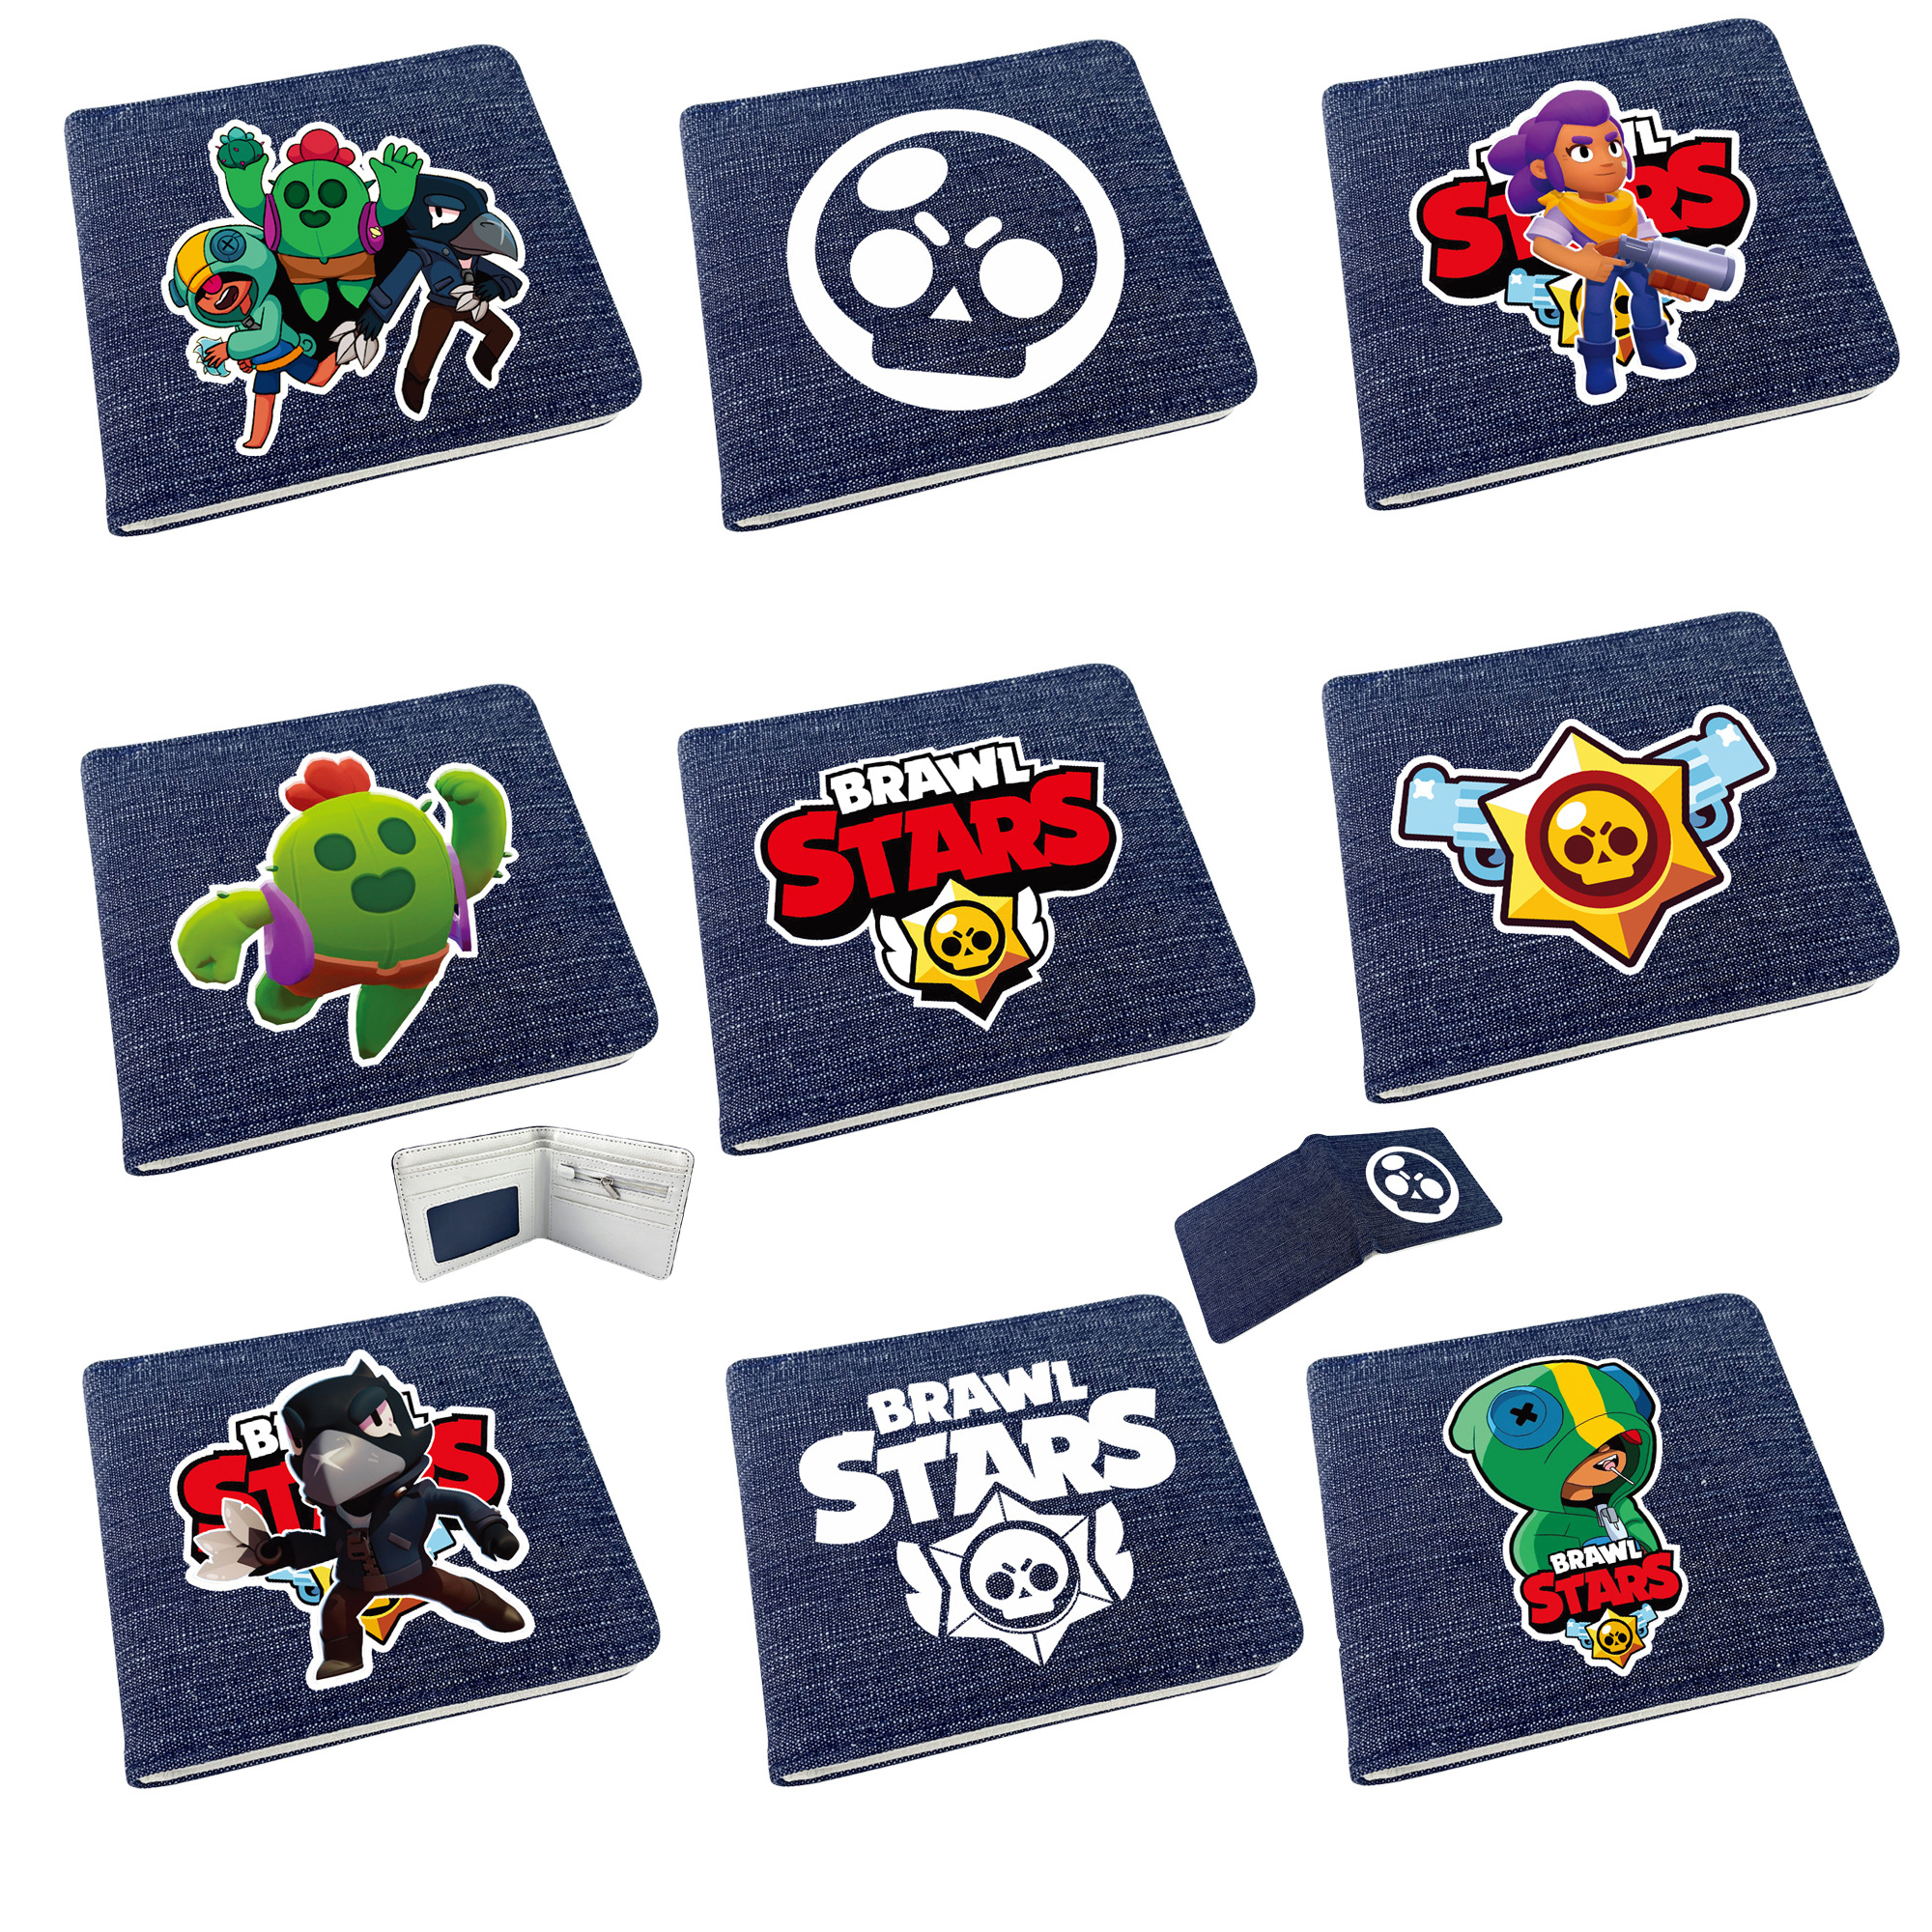 BrawlING Games StarS Wallet Cartoon Purse Long Coin Purse Holder Money Clutch Wristlet Child Cover Organizer Wallet Card Holder